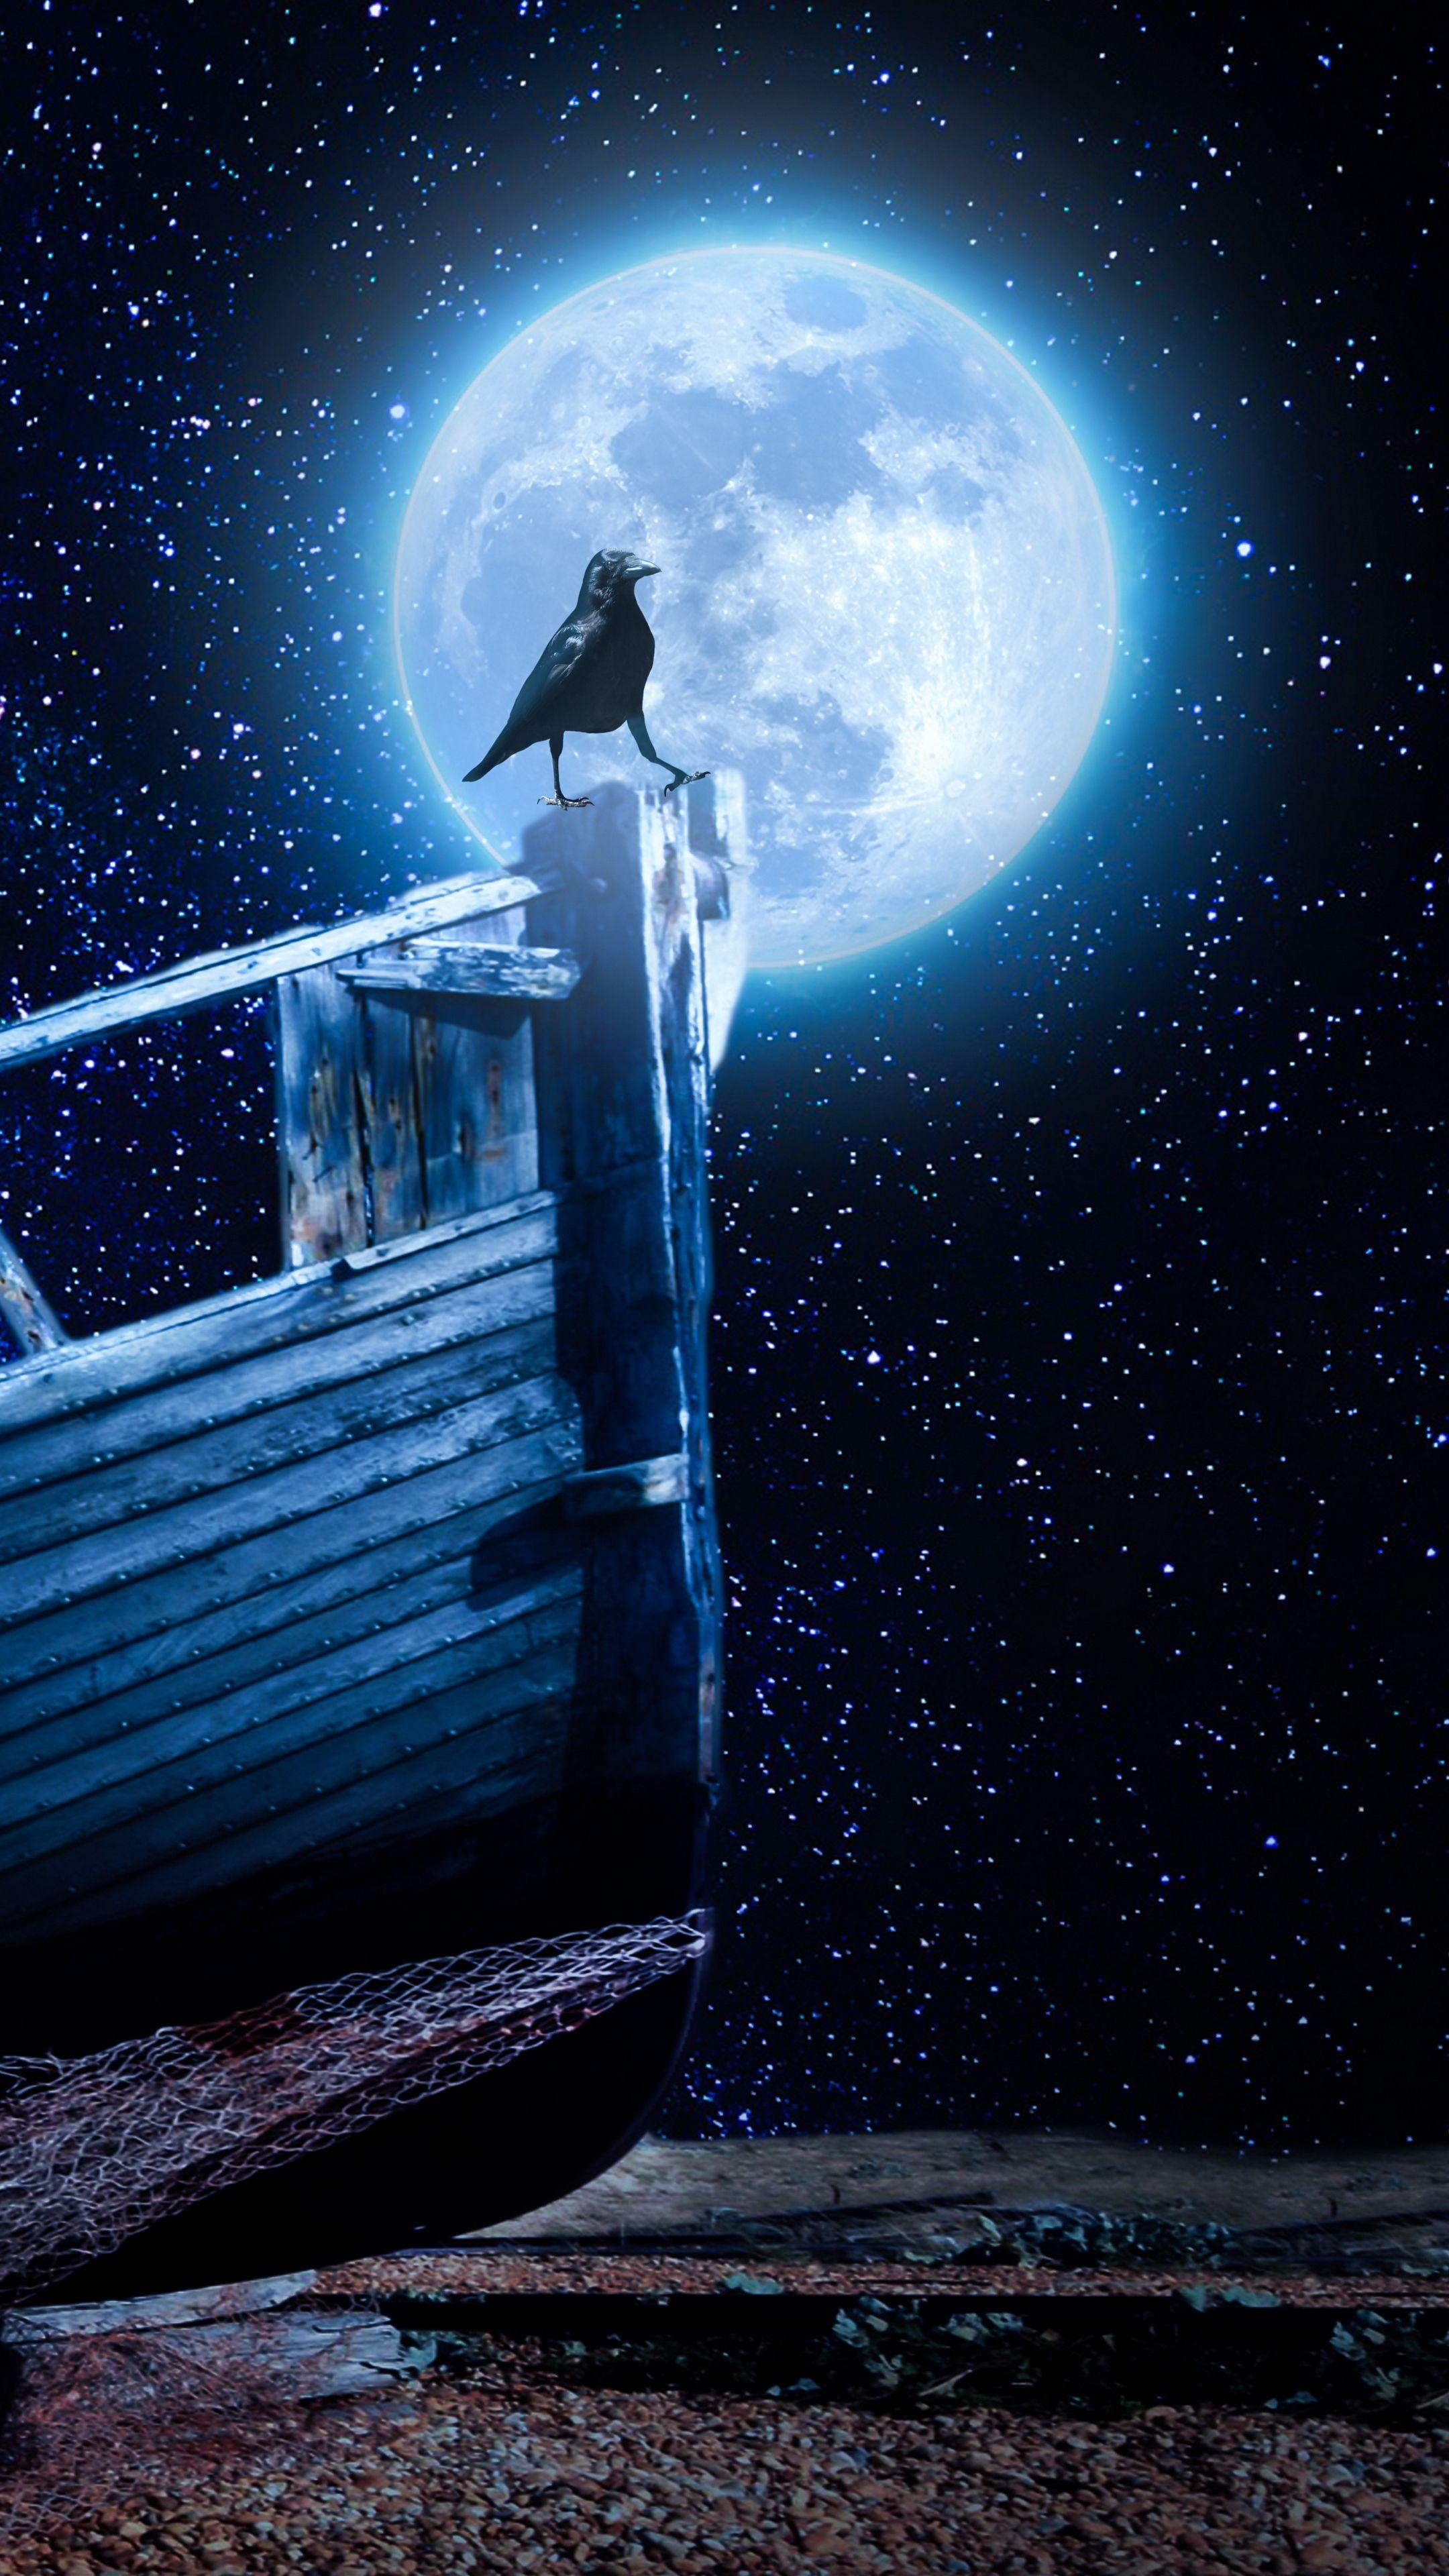 Misc crow, starry sky, boat wallpapers hd 4k